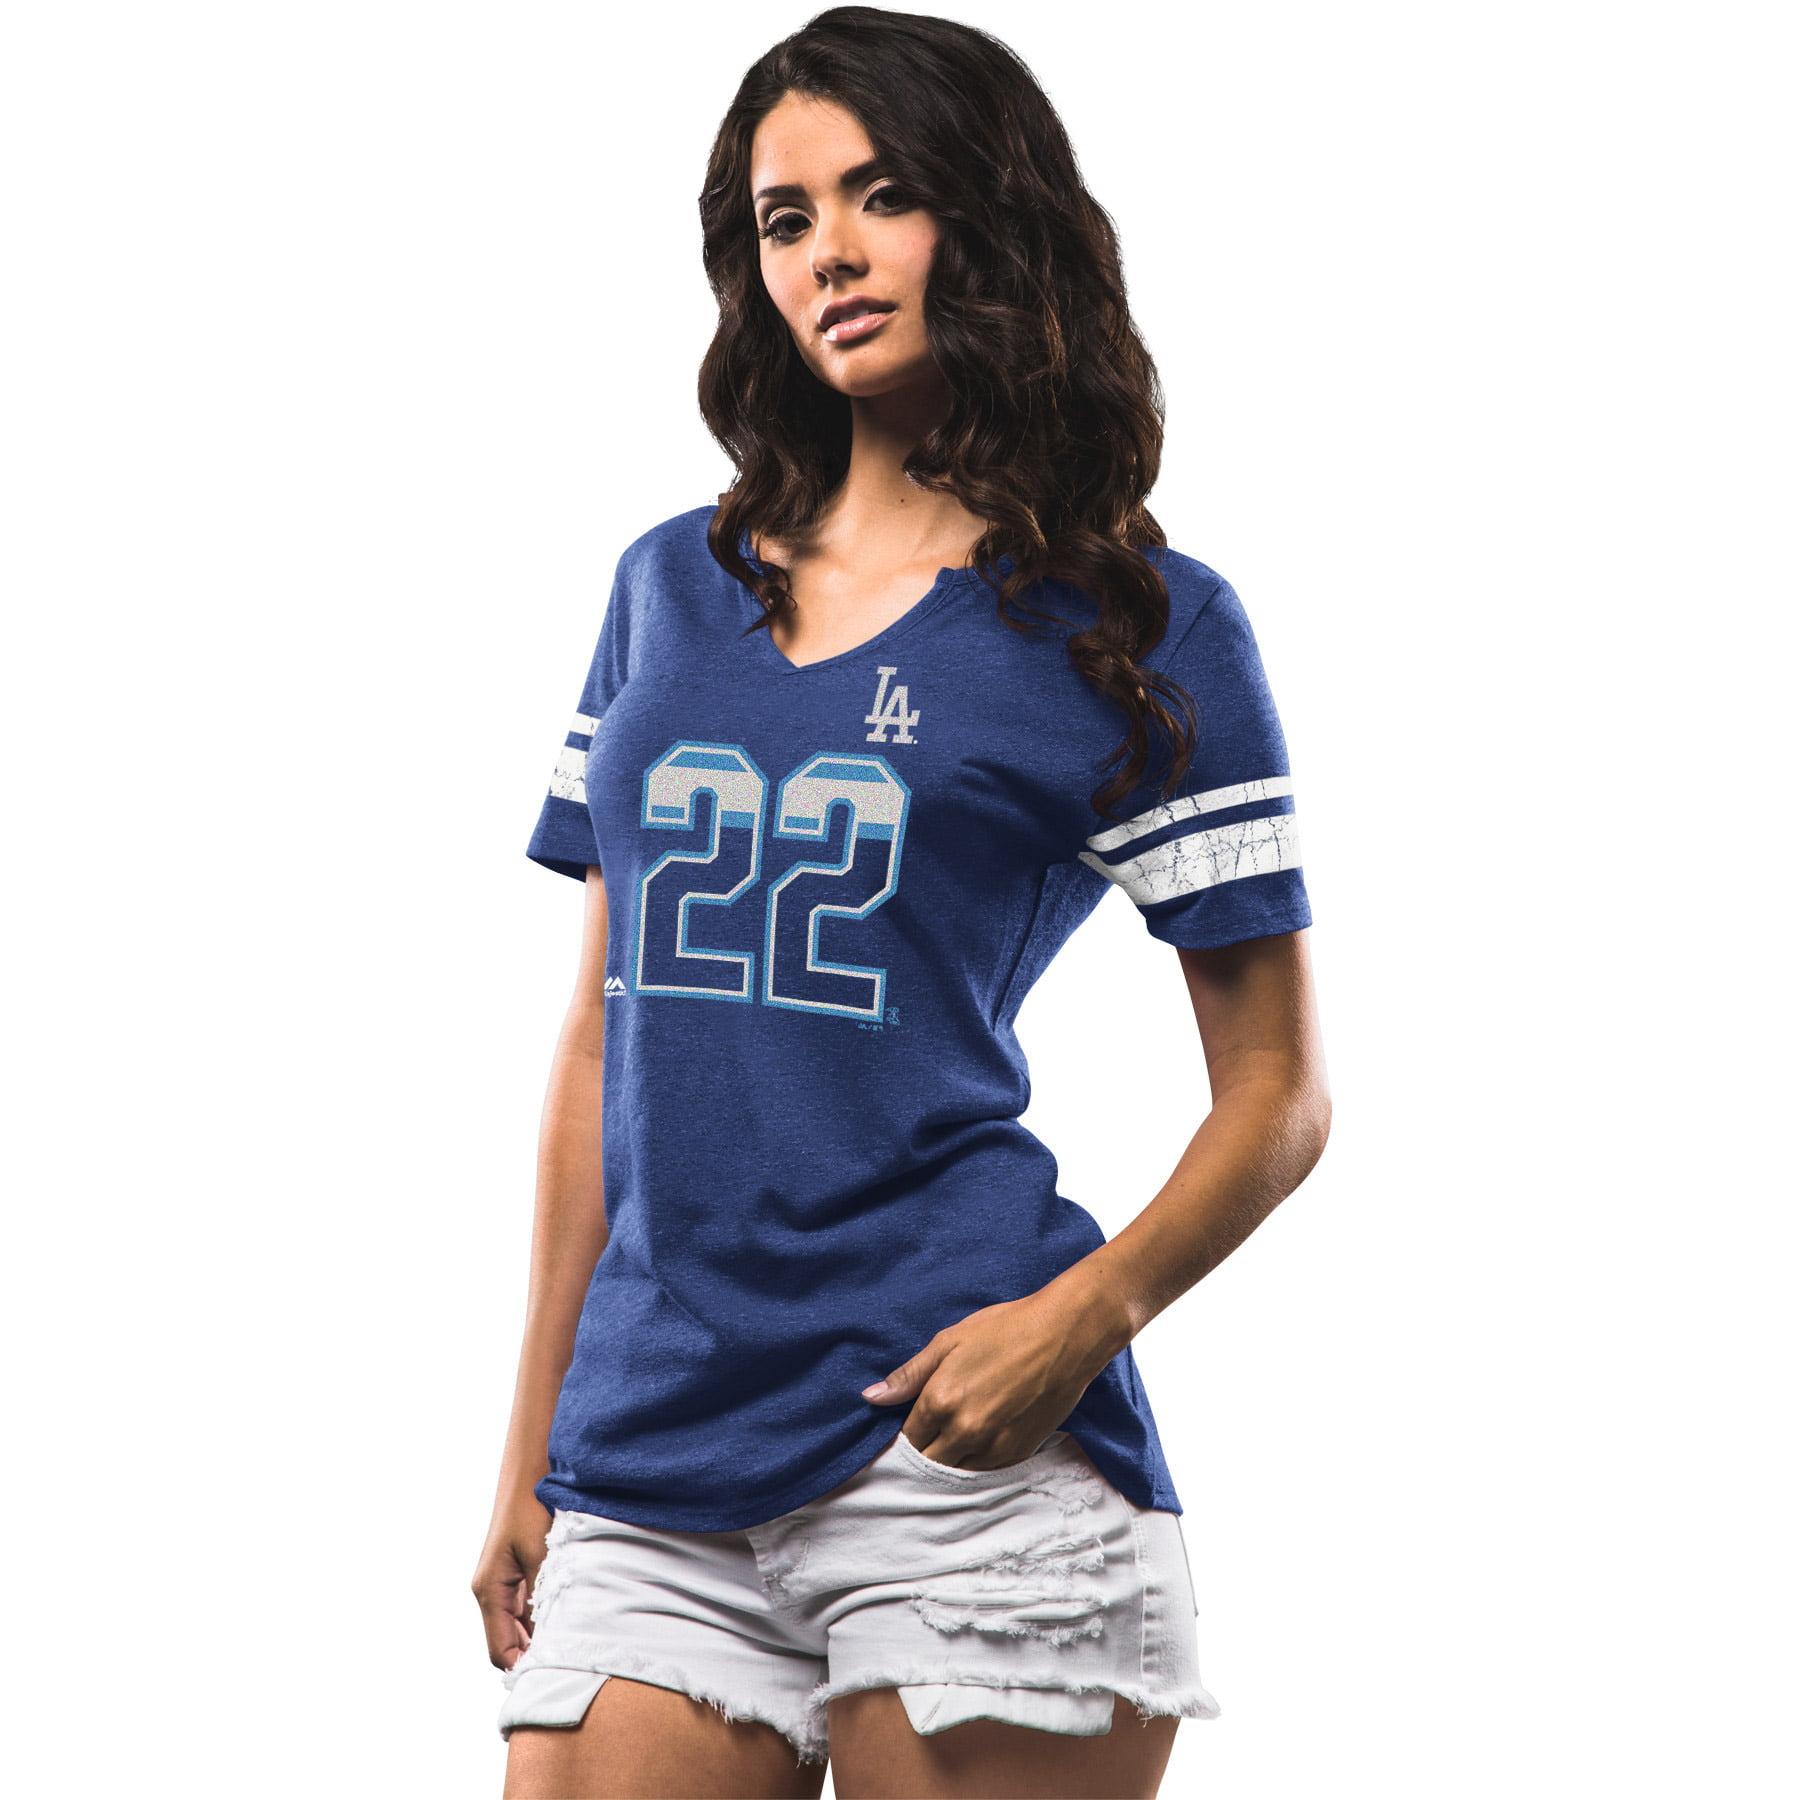 Clayton Kershaw Los Angeles Dodgers Majestic Women's Act Invincible Tri-Blend T-Shirt - Royal